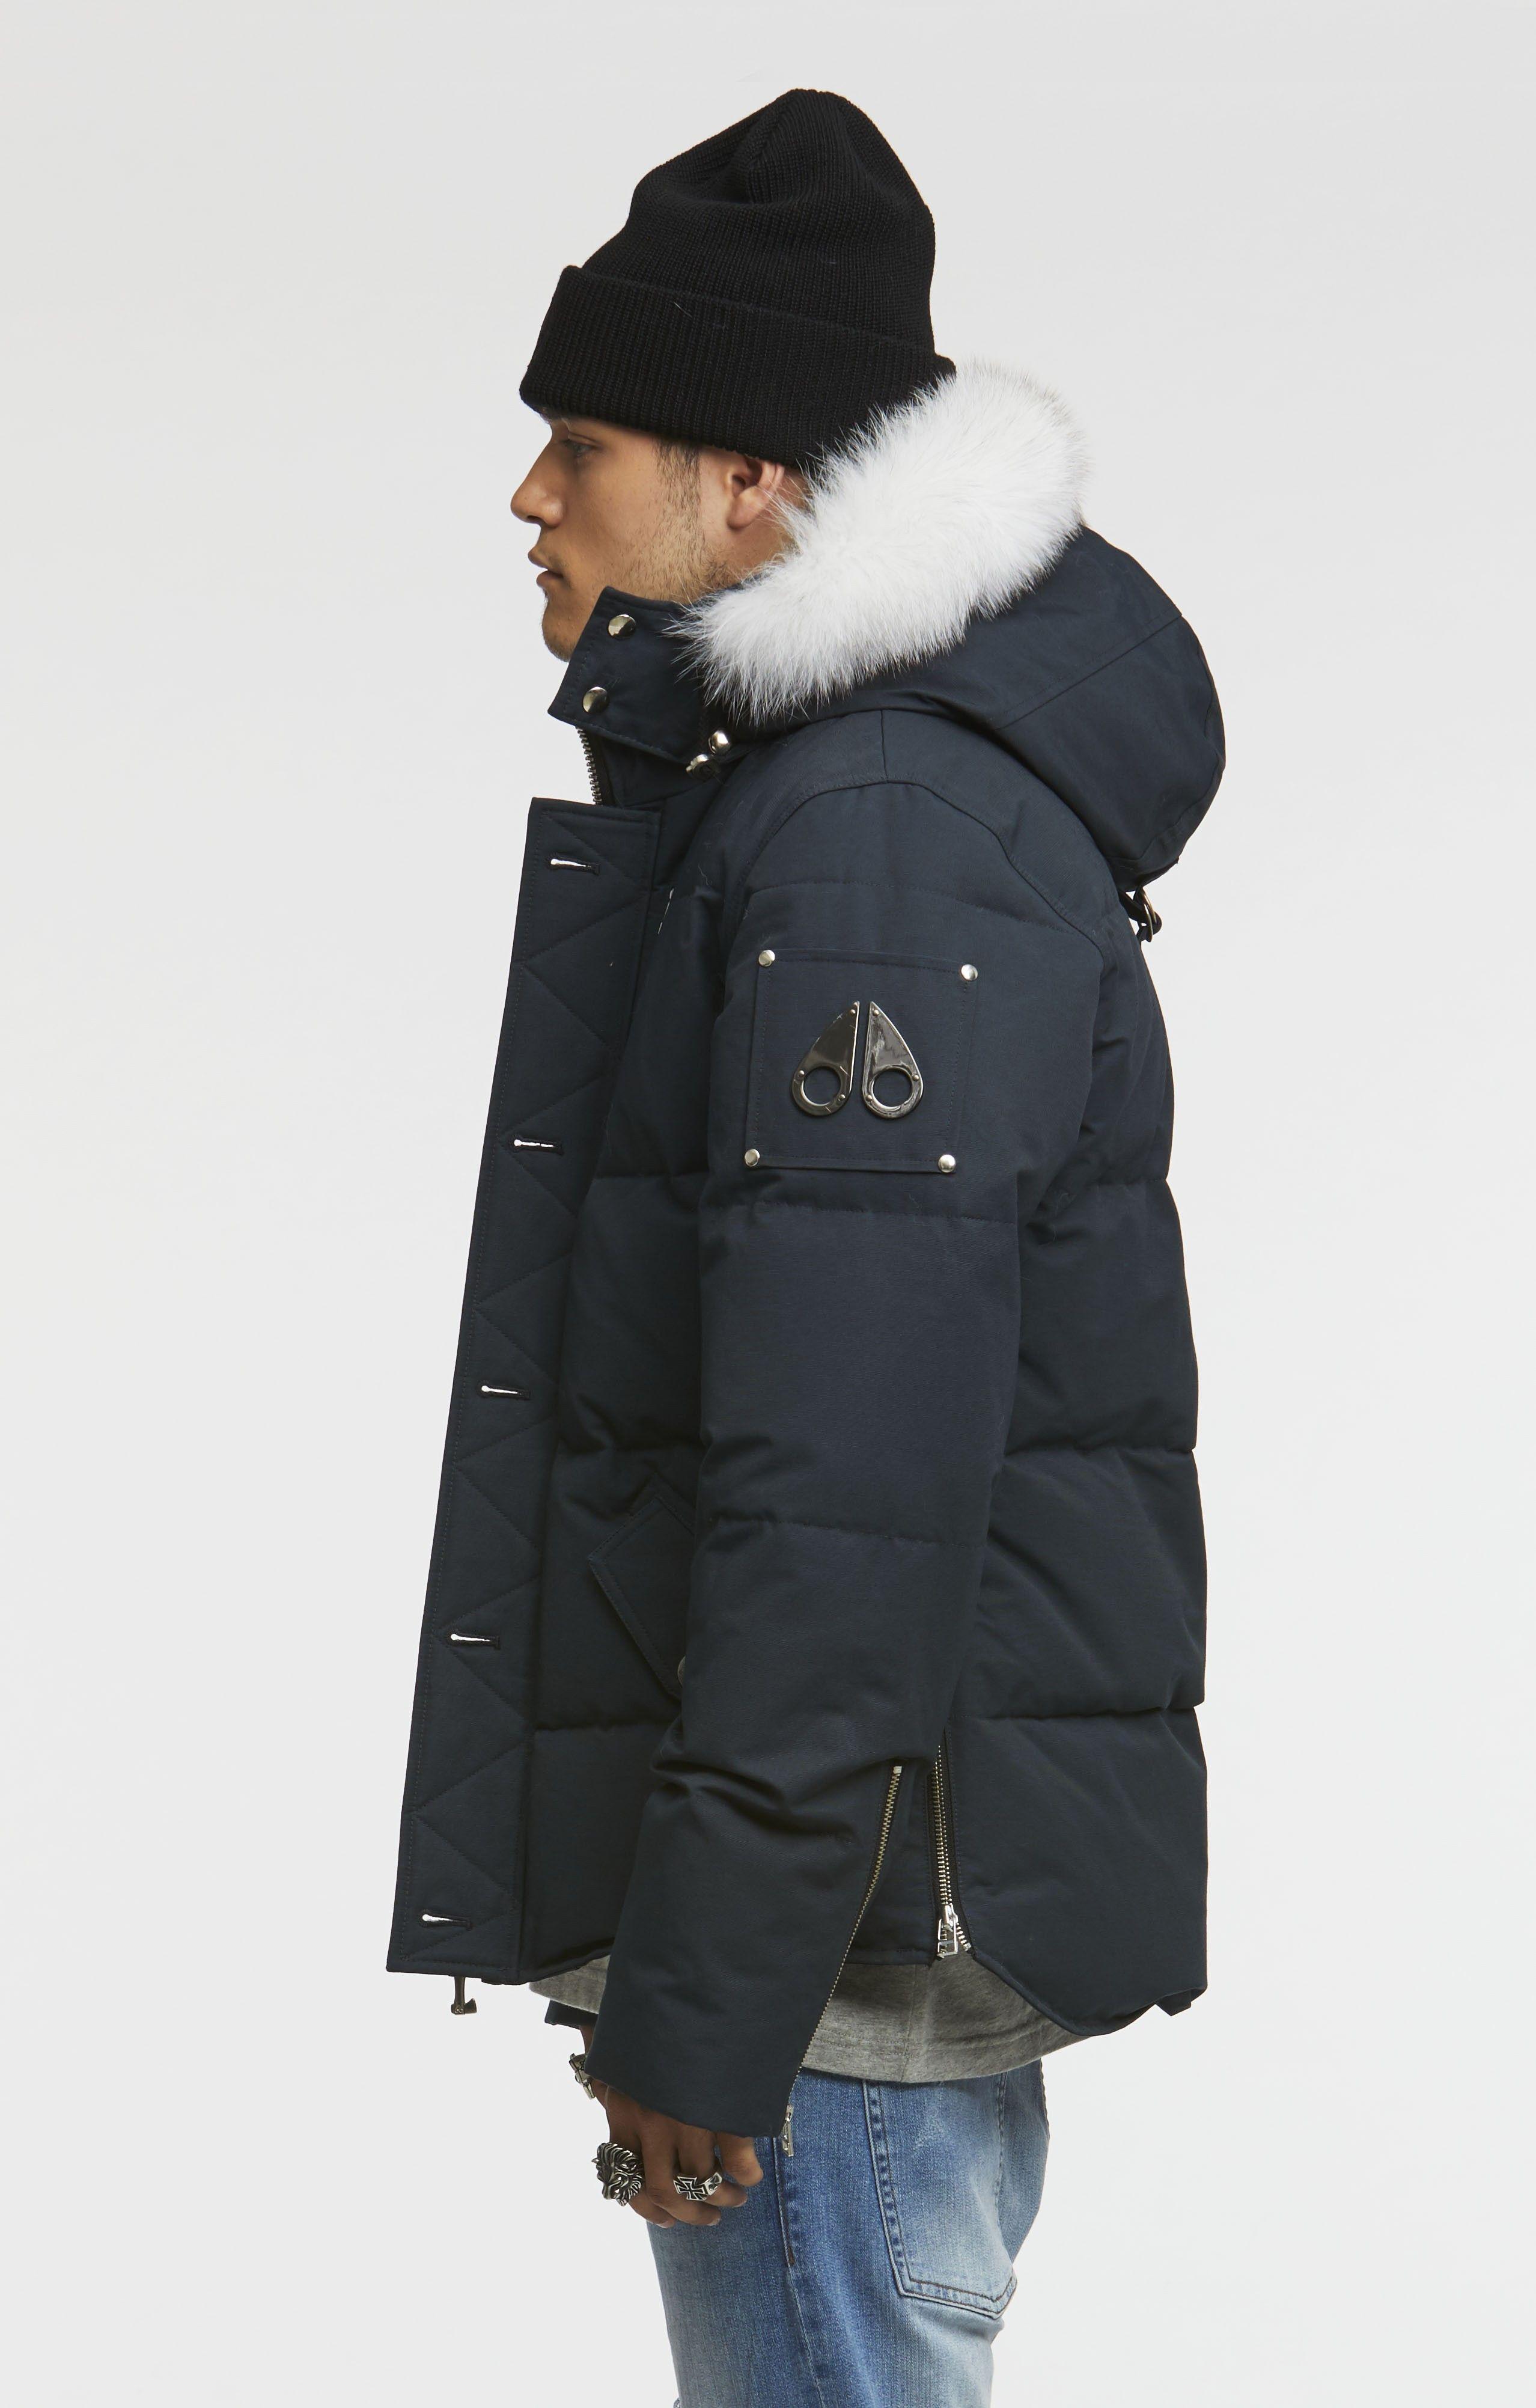 3q Jacket Men Moose Knuckles Streetwear Manner Streetwear